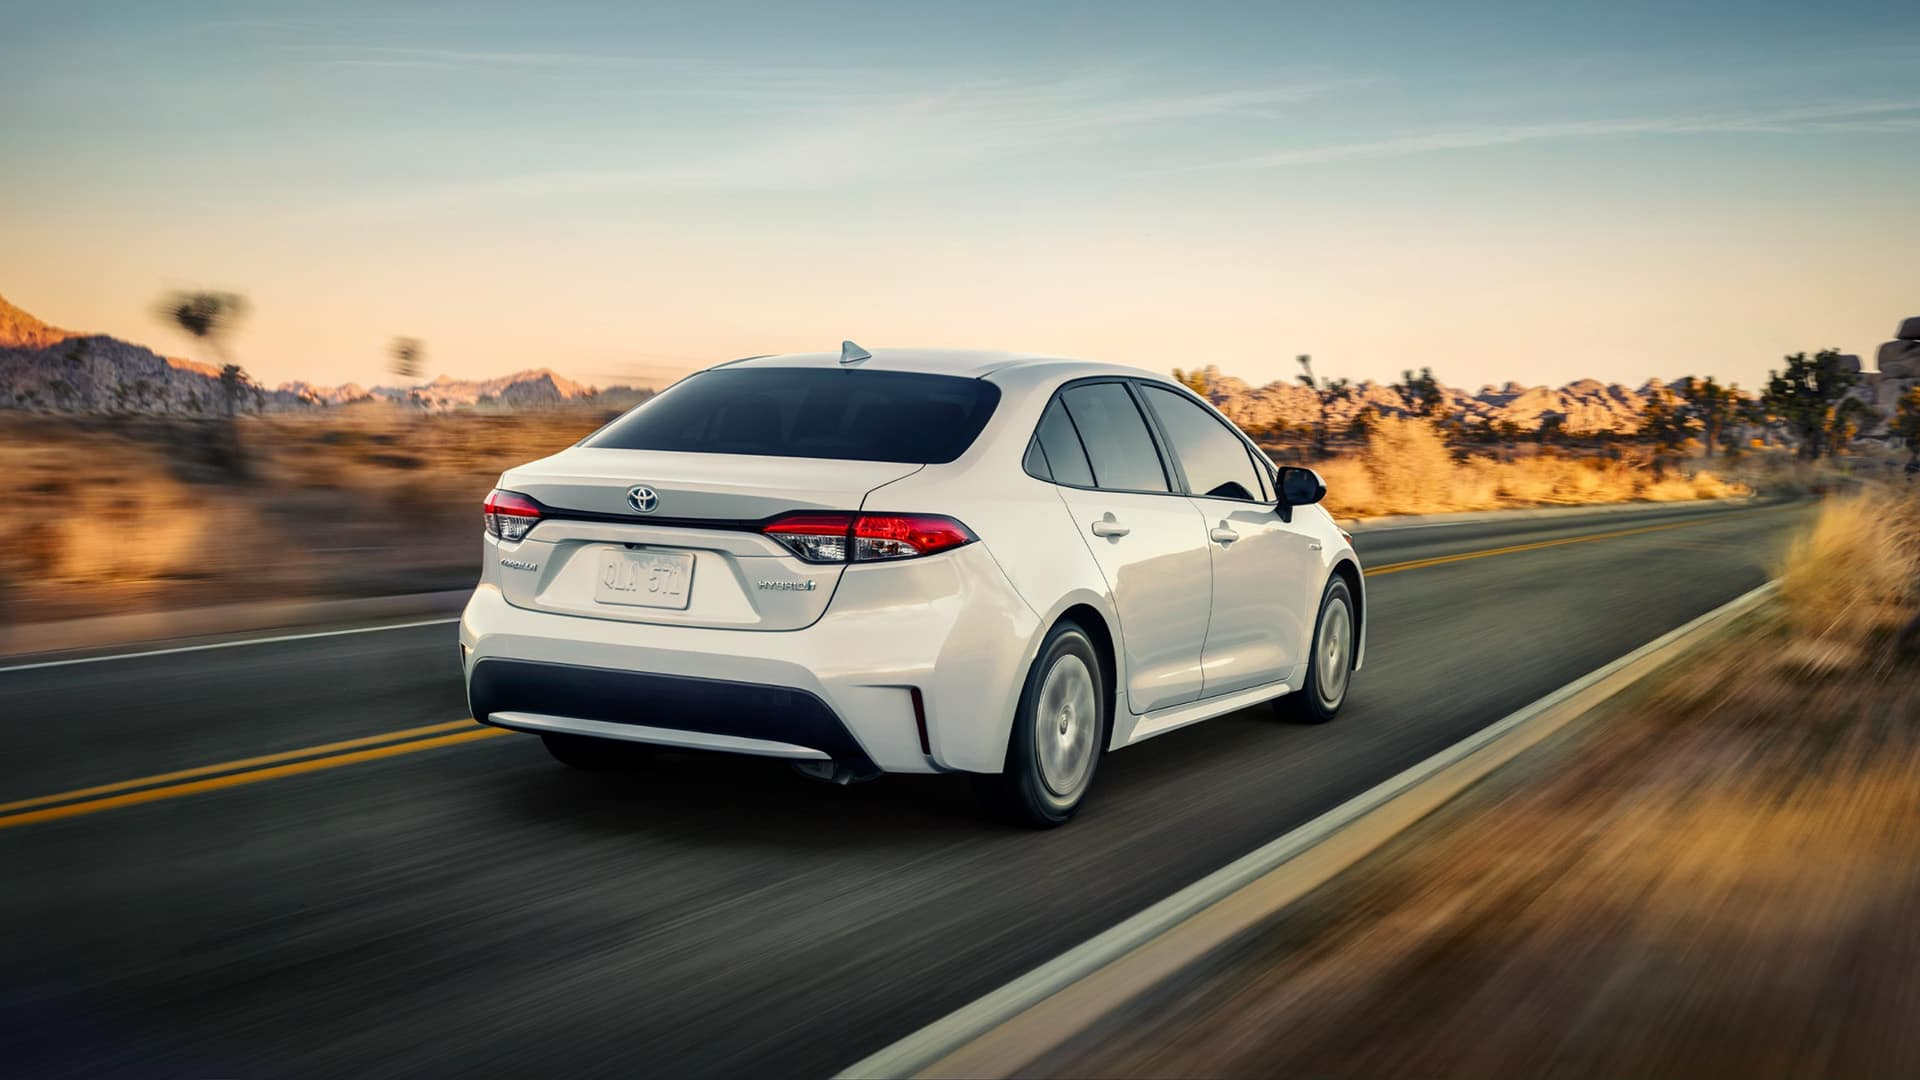 2021 Toyota Corolla Hybrid near St. Louis